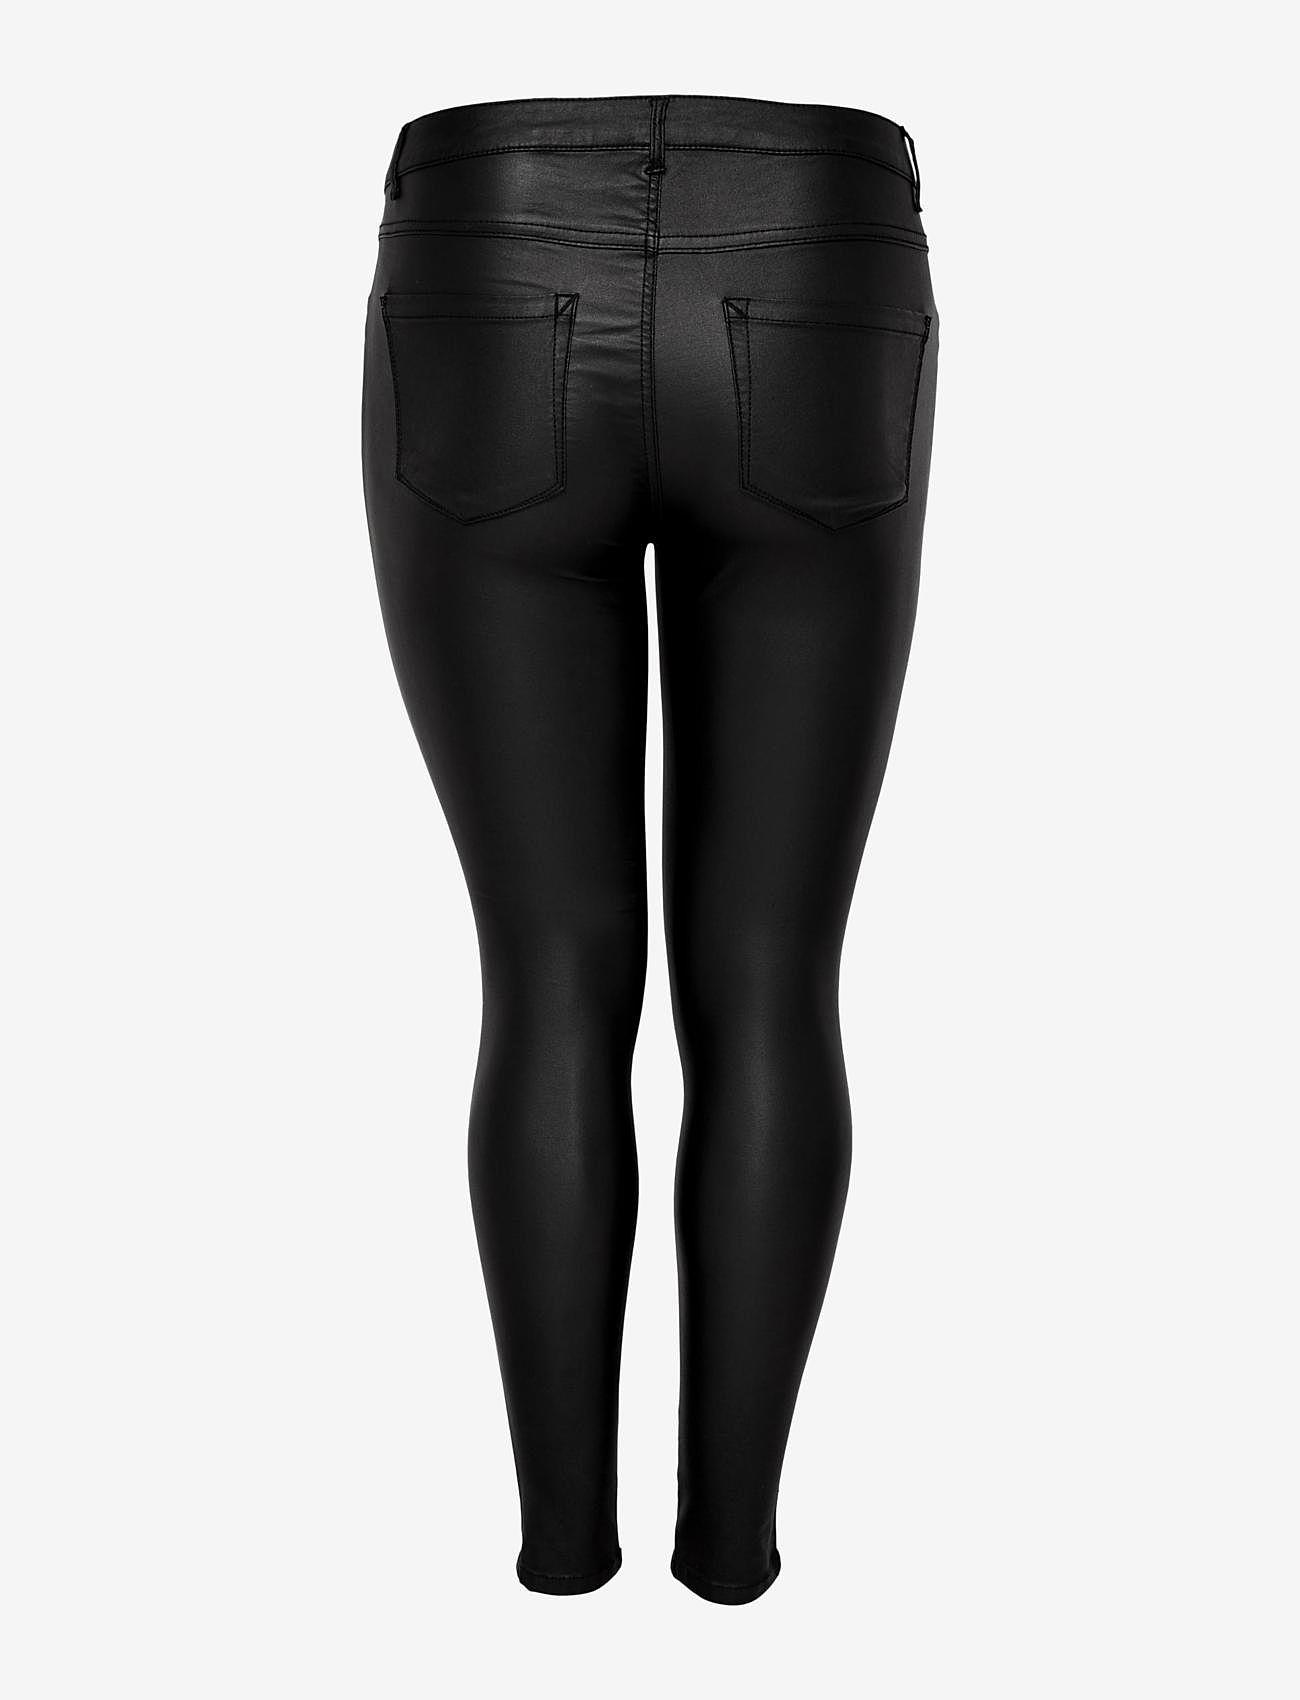 ONLY Carmakoma - CARPUNK REG SK COATED PANTS - slim fit bukser - black - 1